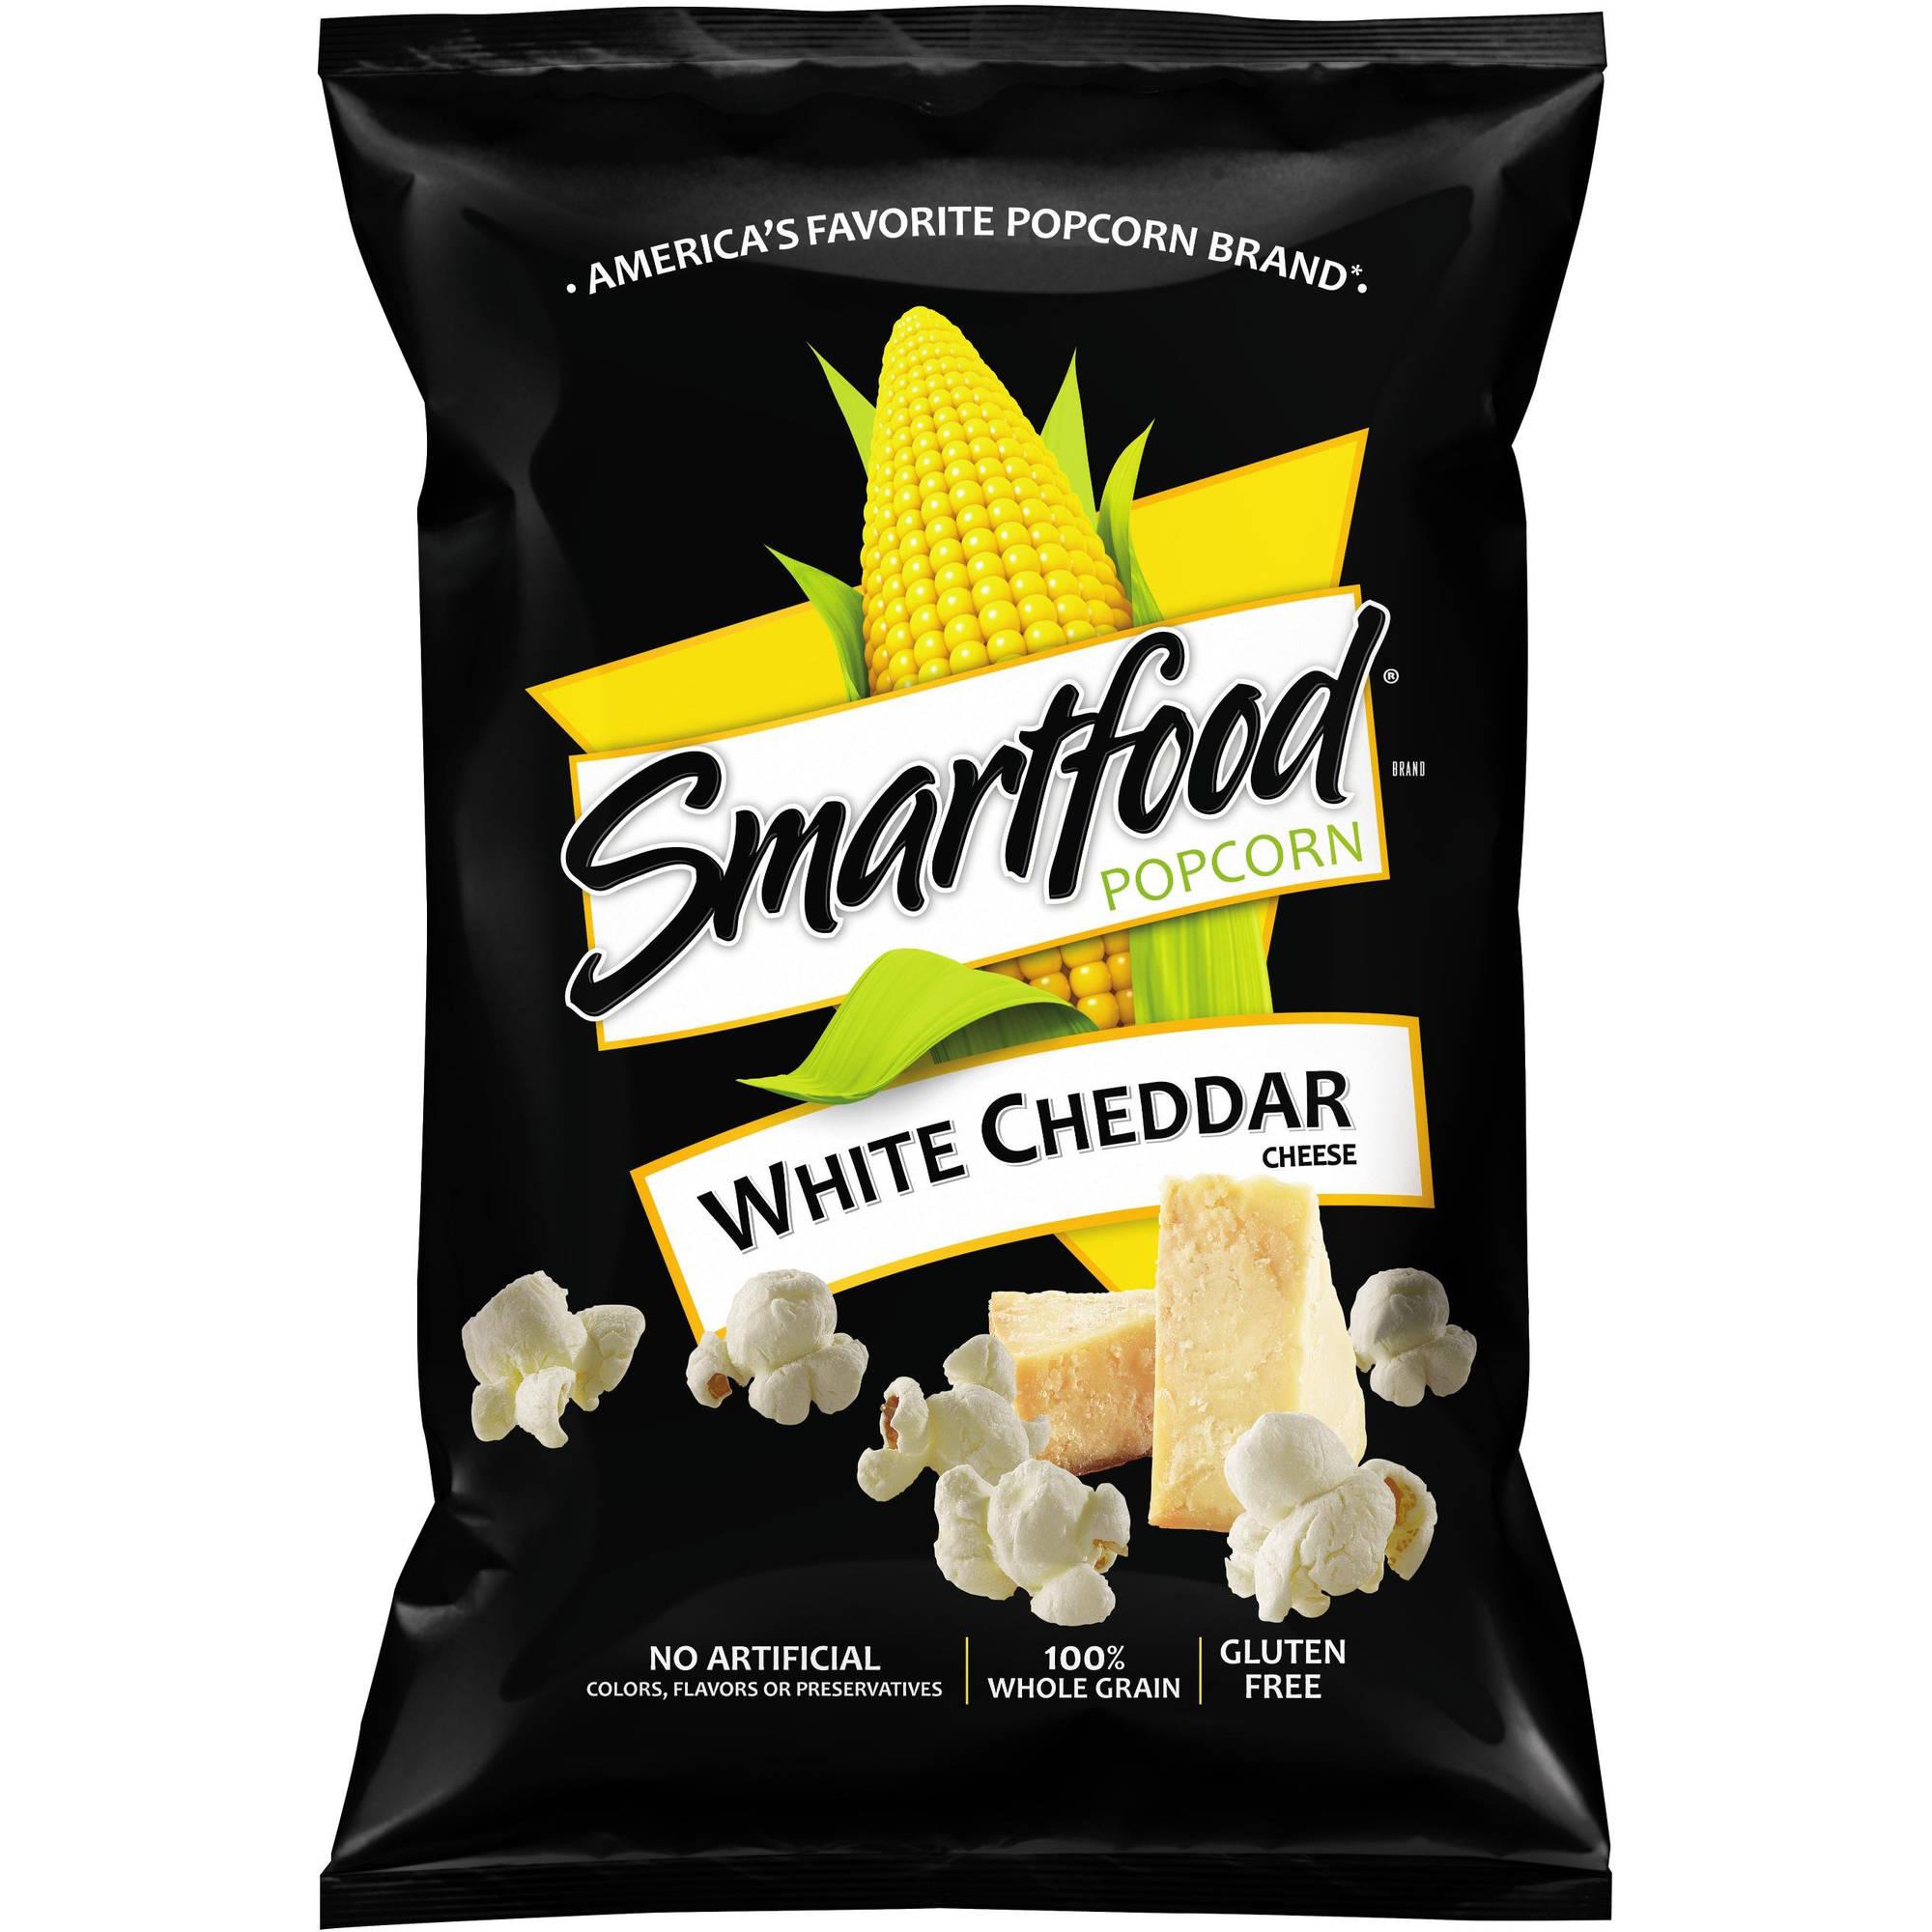 Smartfood White Cheddar Cheese Popcorn, 5 oz